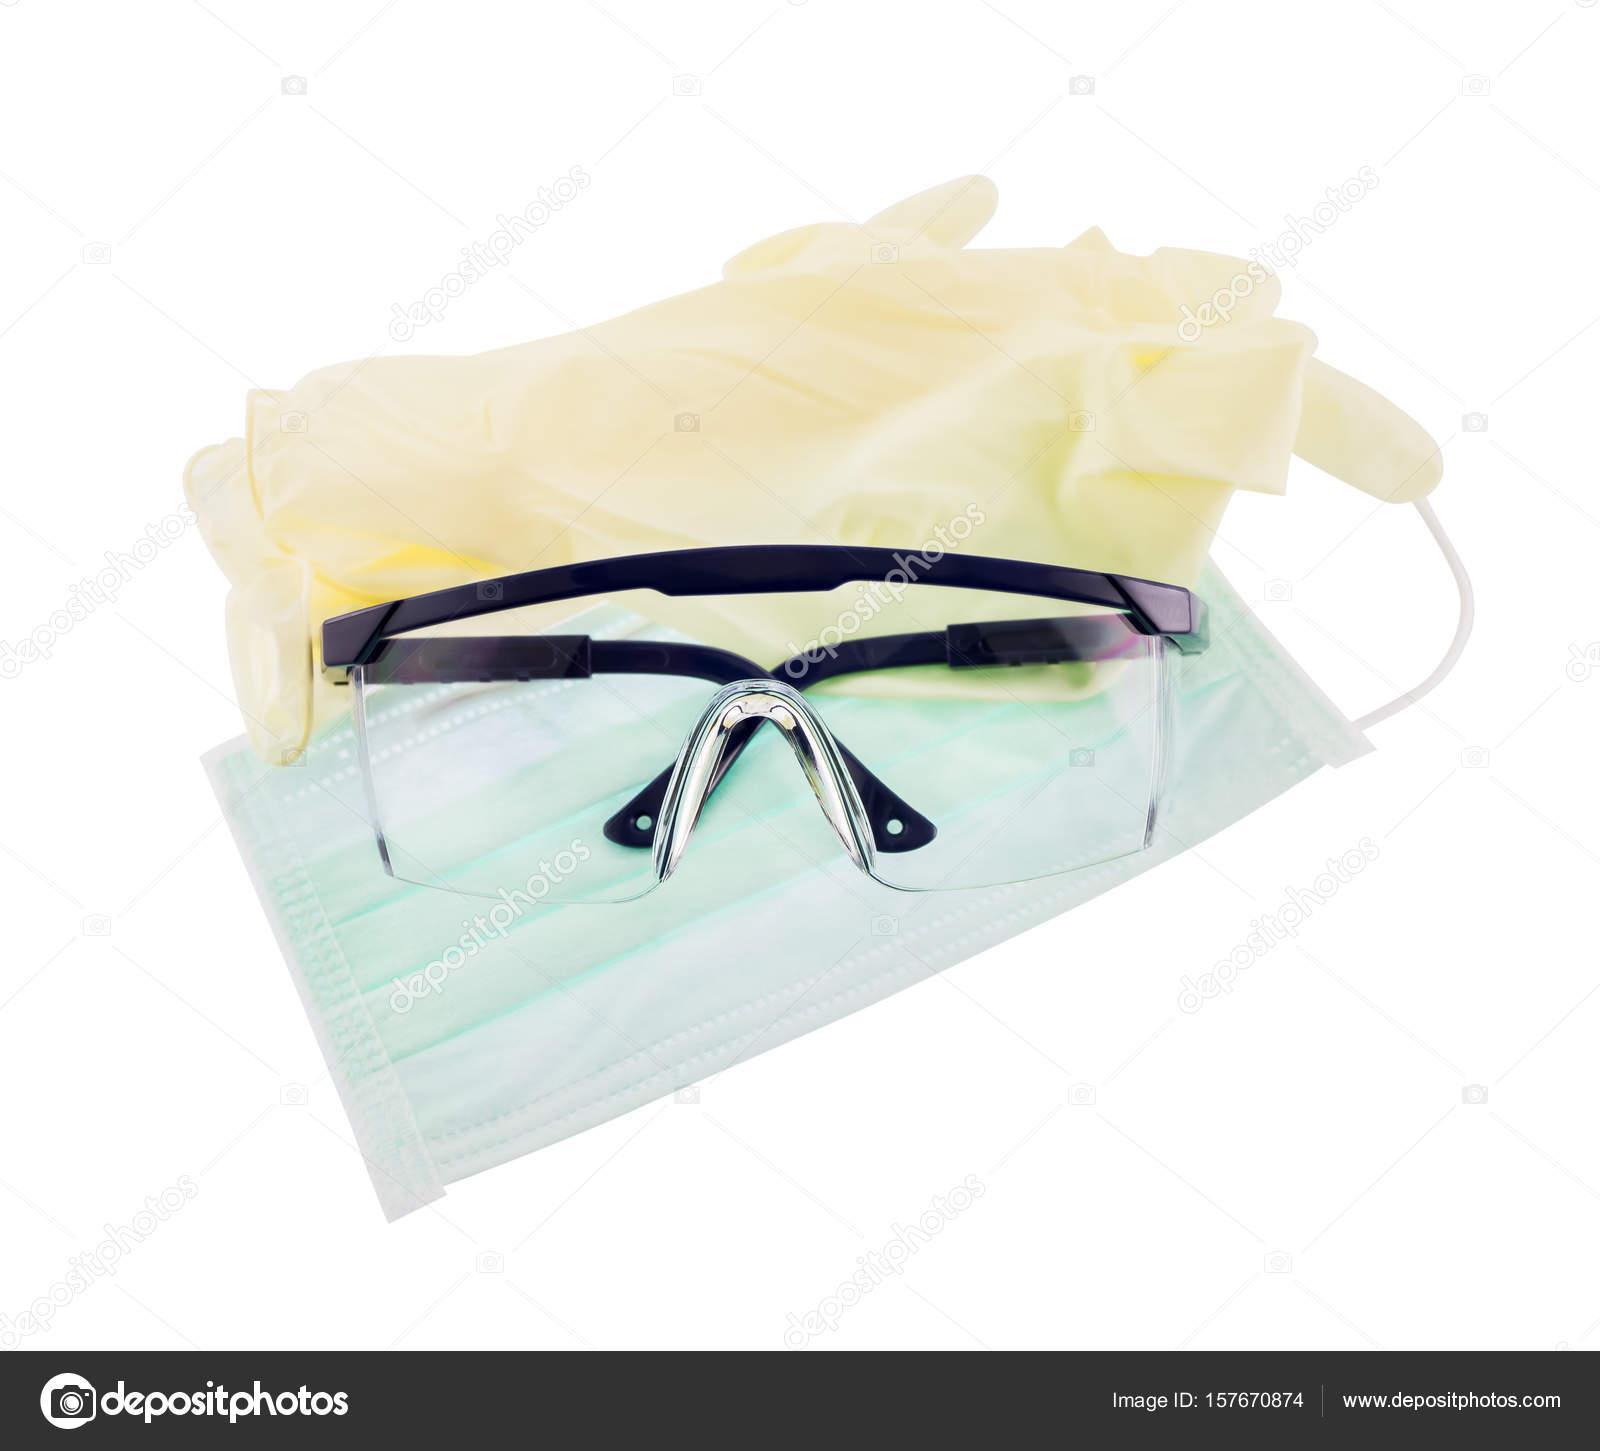 f8c2222e31d14 Luva de máscara óculos de equipamentos de proteção individual — Fotografia  de Stock